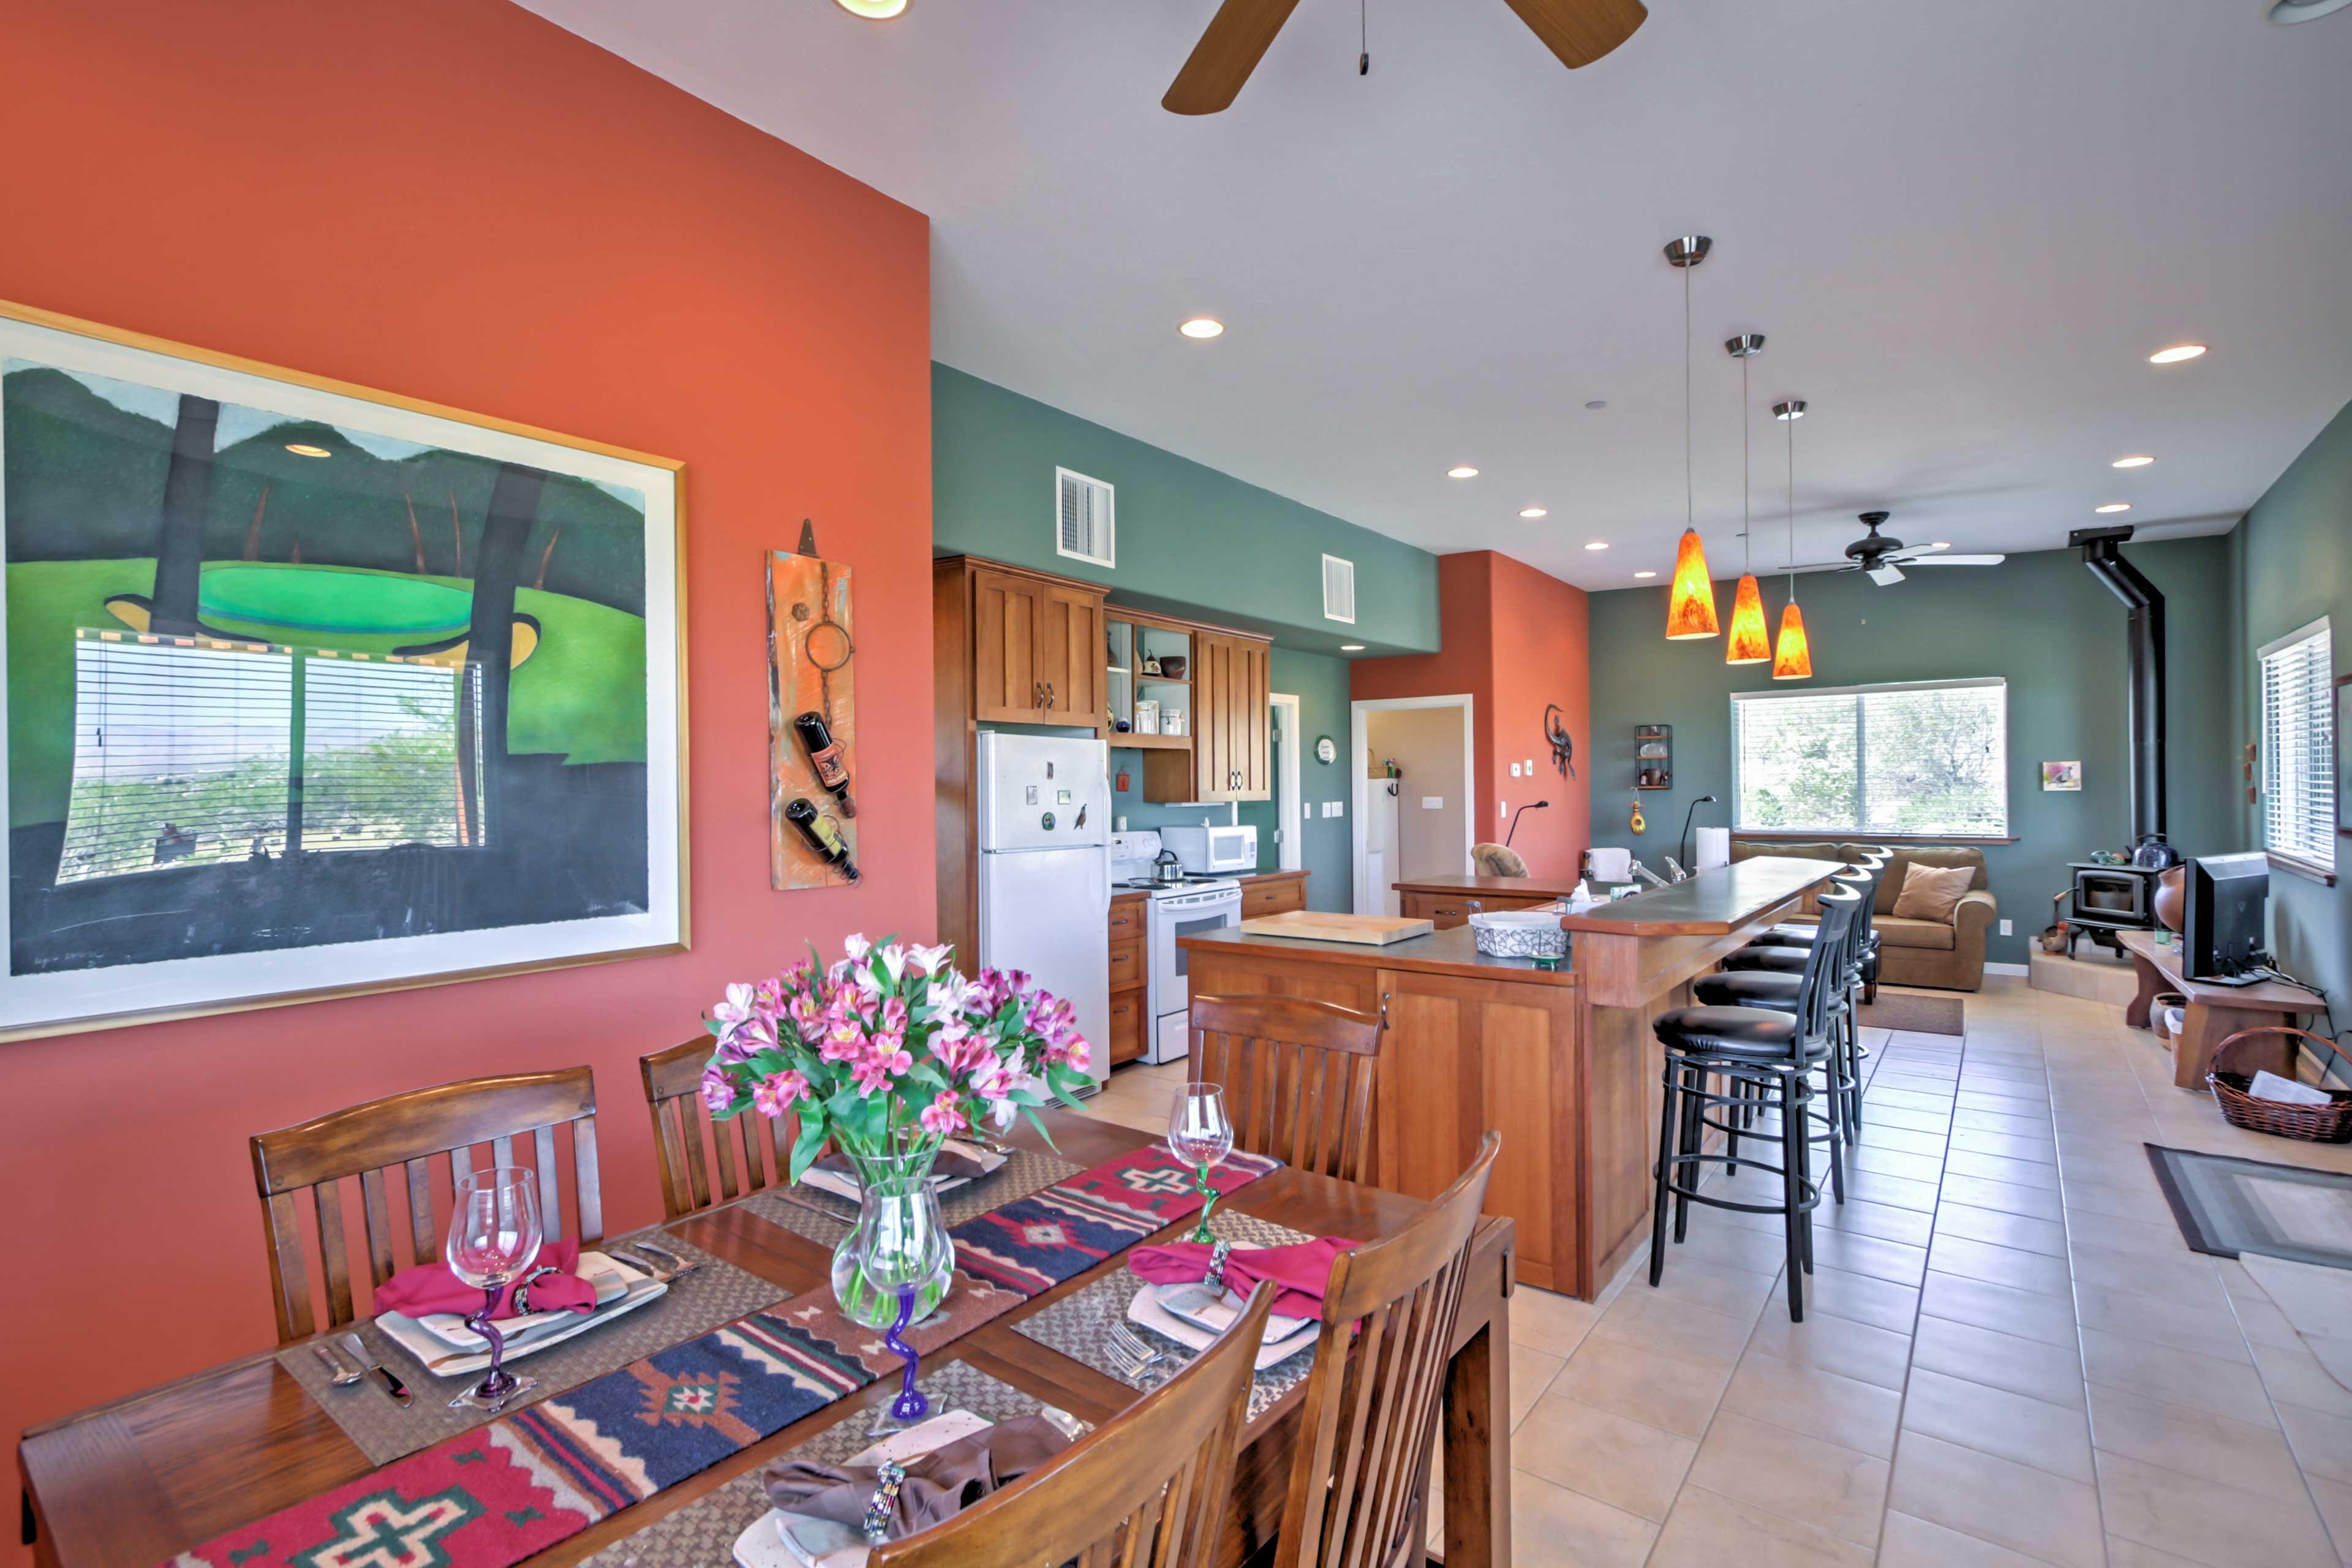 Vibrant colors, natural light, and southwestern decor fill the interior.